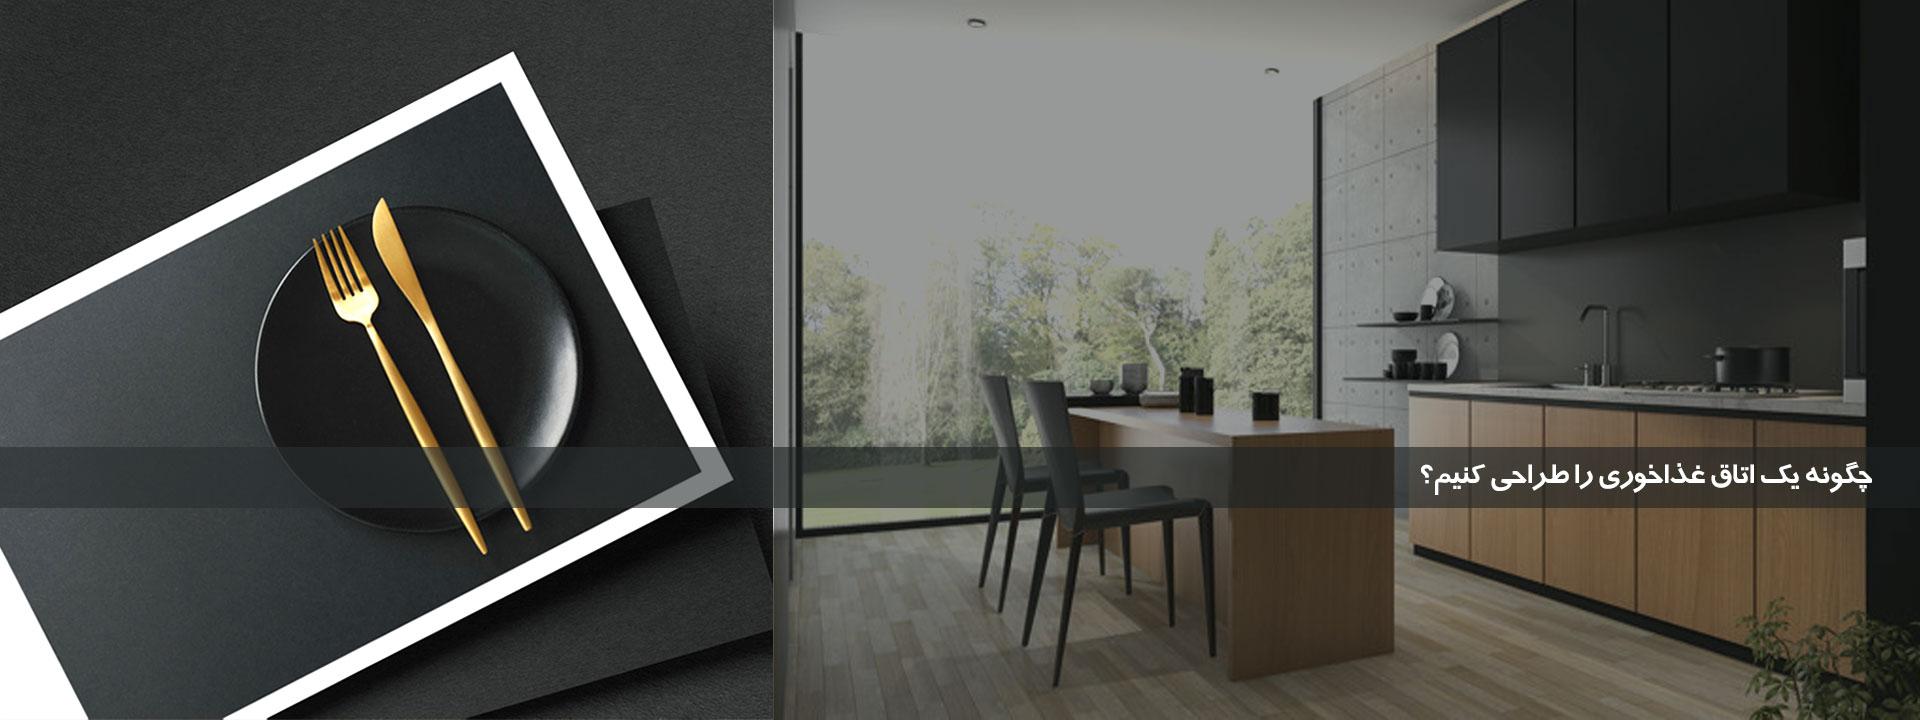 design Dining Room 111 - طراحی اتاق غذاخوری